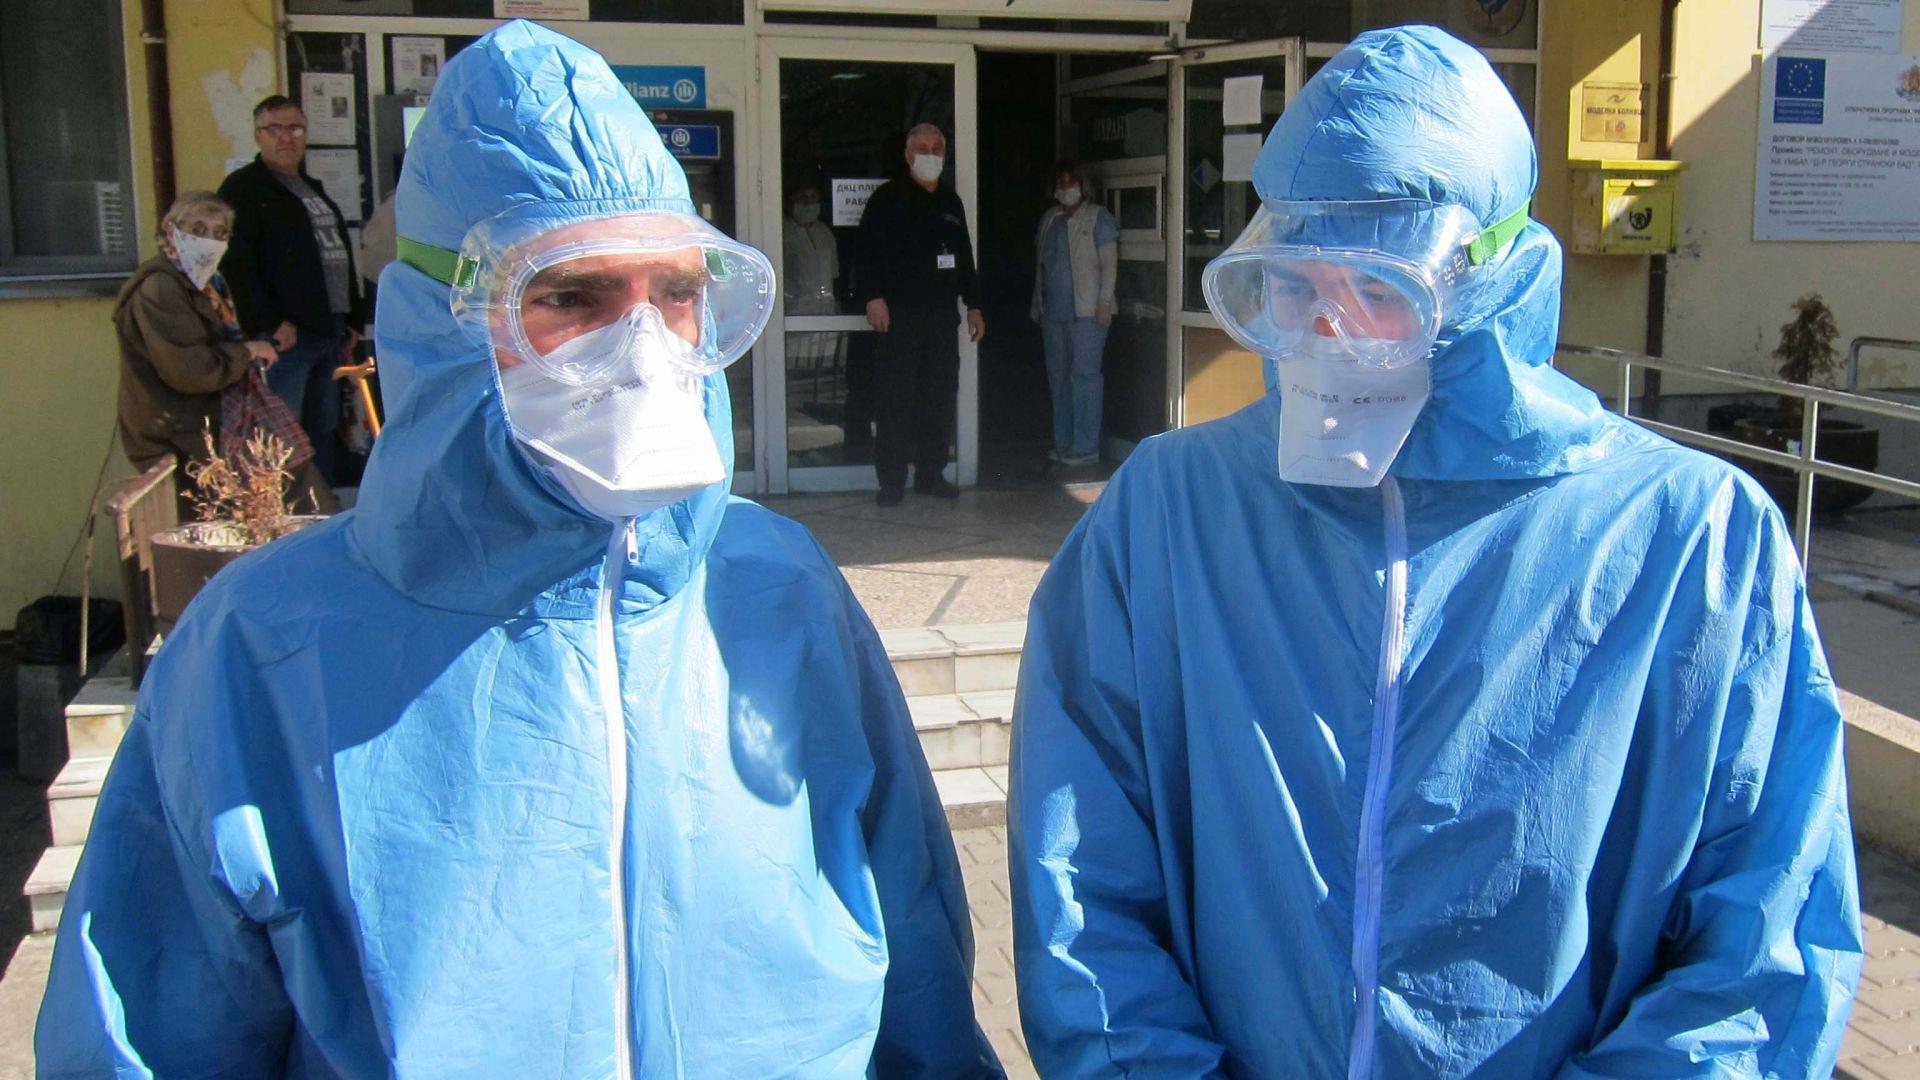 Плевенската болница получи маски, гащеризони и очила срещу коронавируса